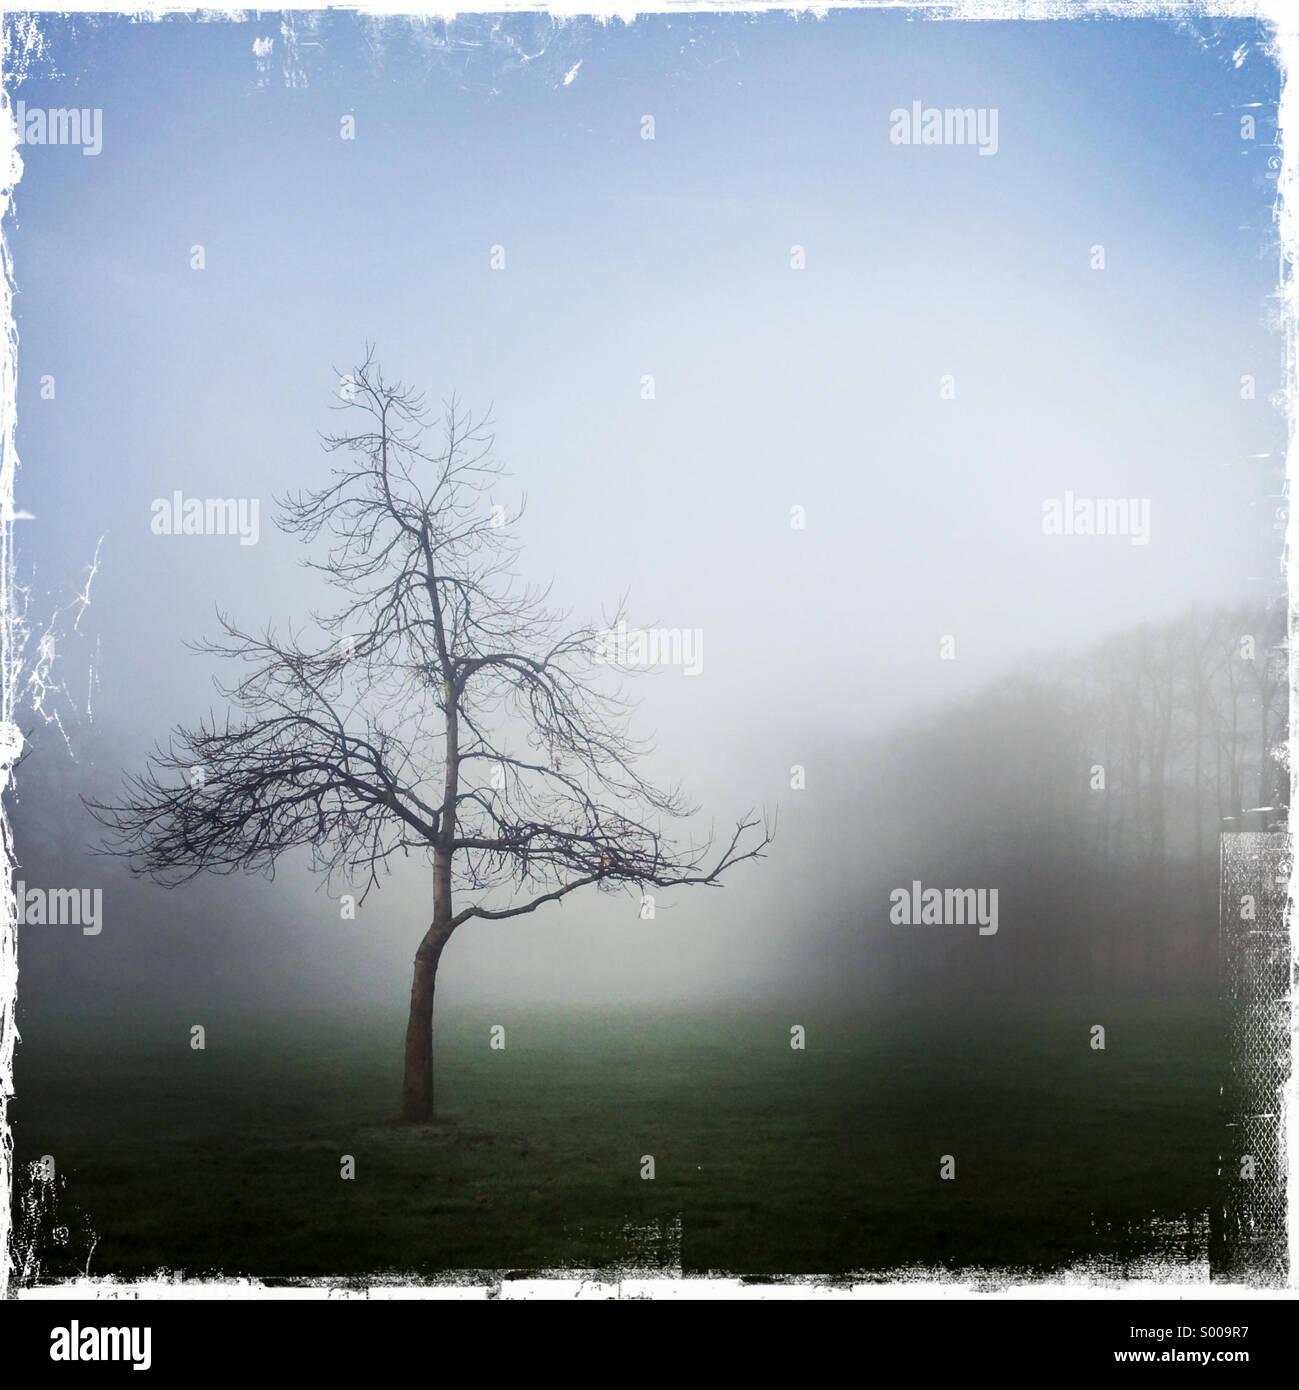 Arbre isolé dans le brouillard Photo Stock